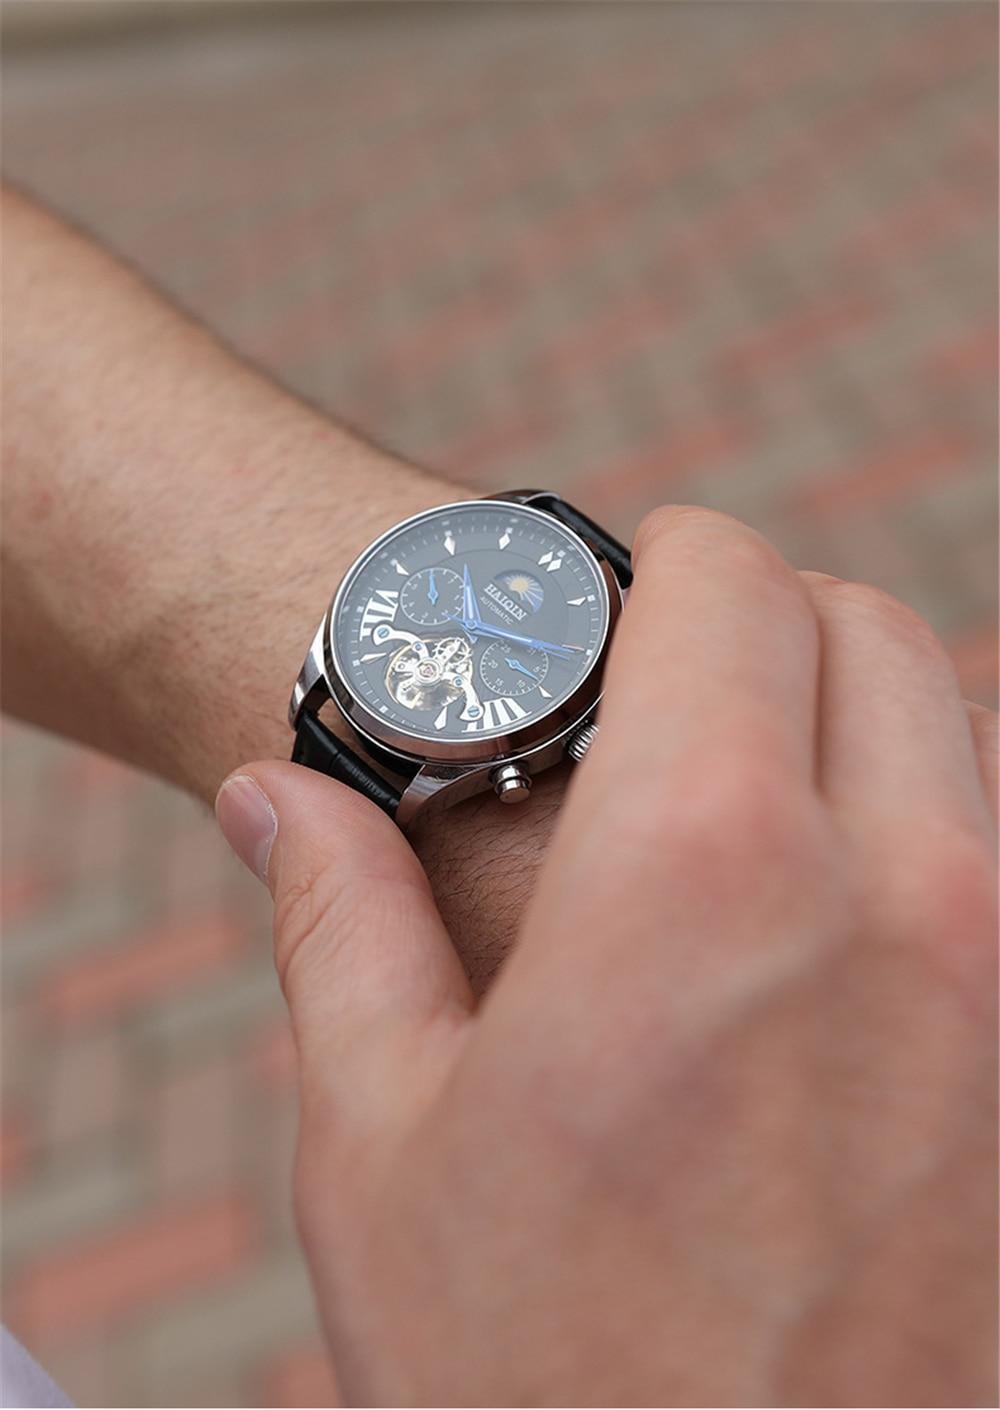 HTB1di9CXOfrK1RjSspbq6A4pFXaY HAIQIN men's/mens watches top brand luxury automatic/mechanical/luxury watch men sport wristwatch mens reloj hombre tourbillon